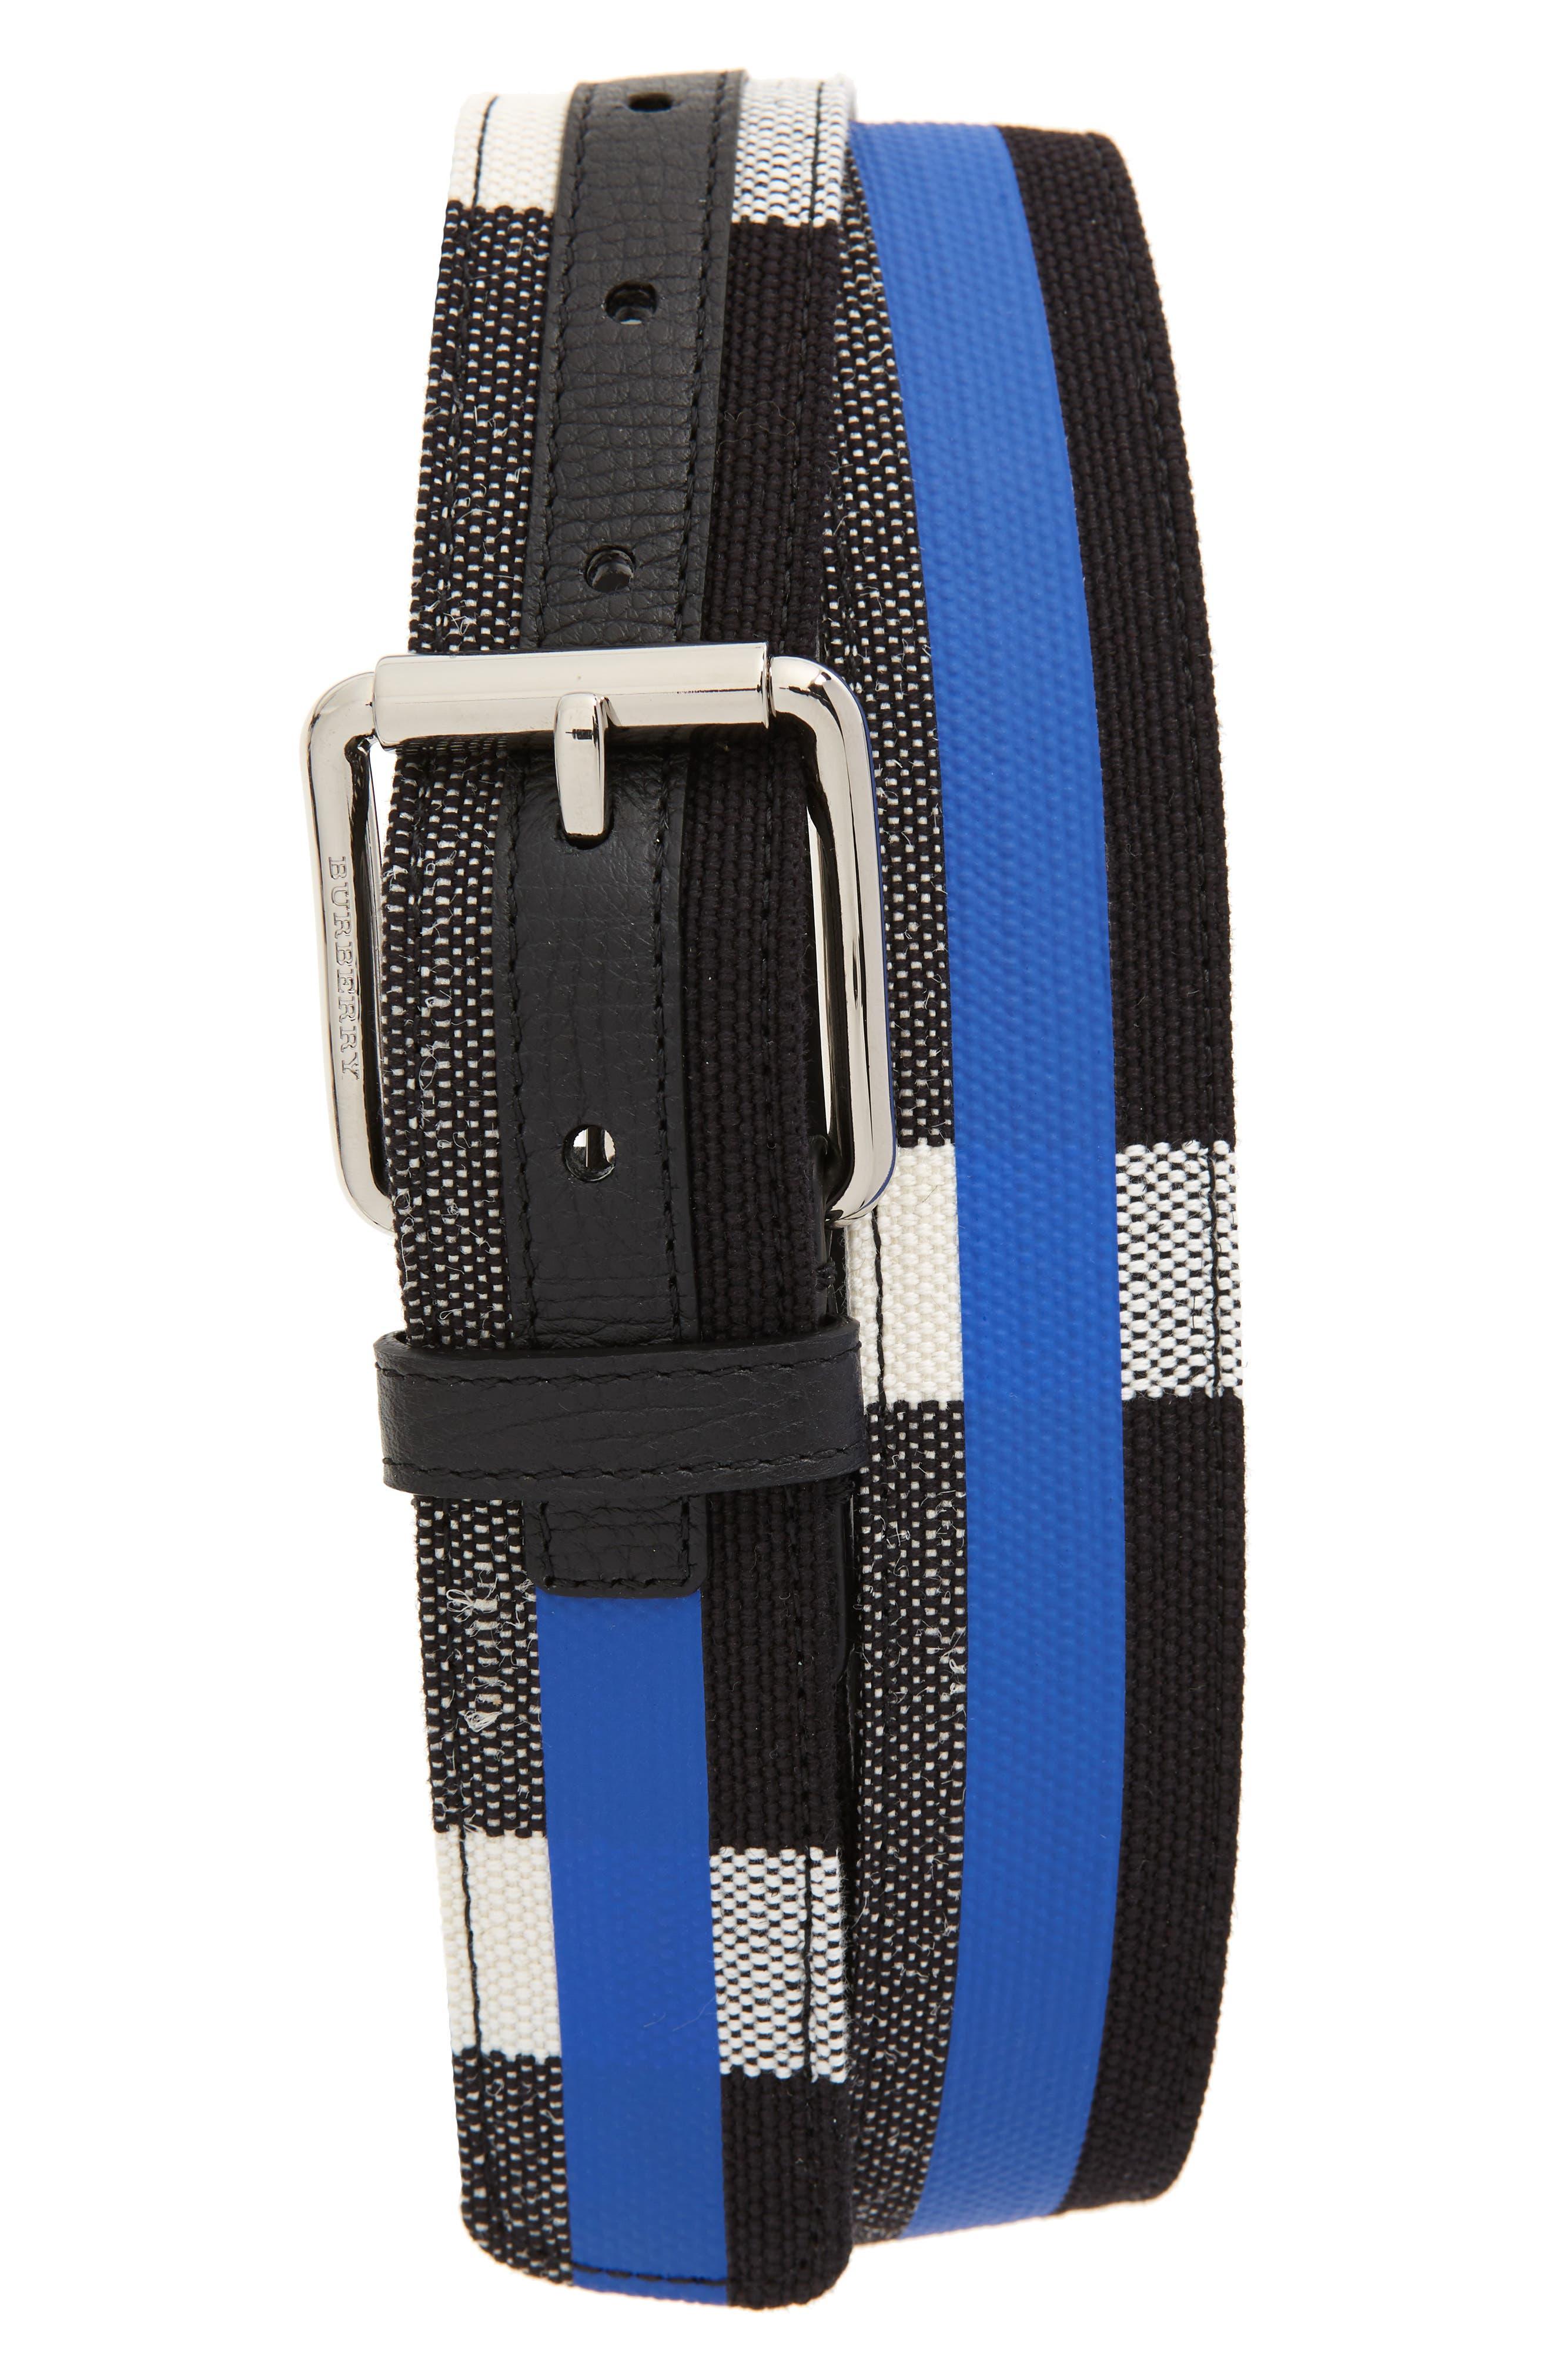 Roller Buckle Woven Belt,                             Main thumbnail 1, color,                             Blueberry/ Black